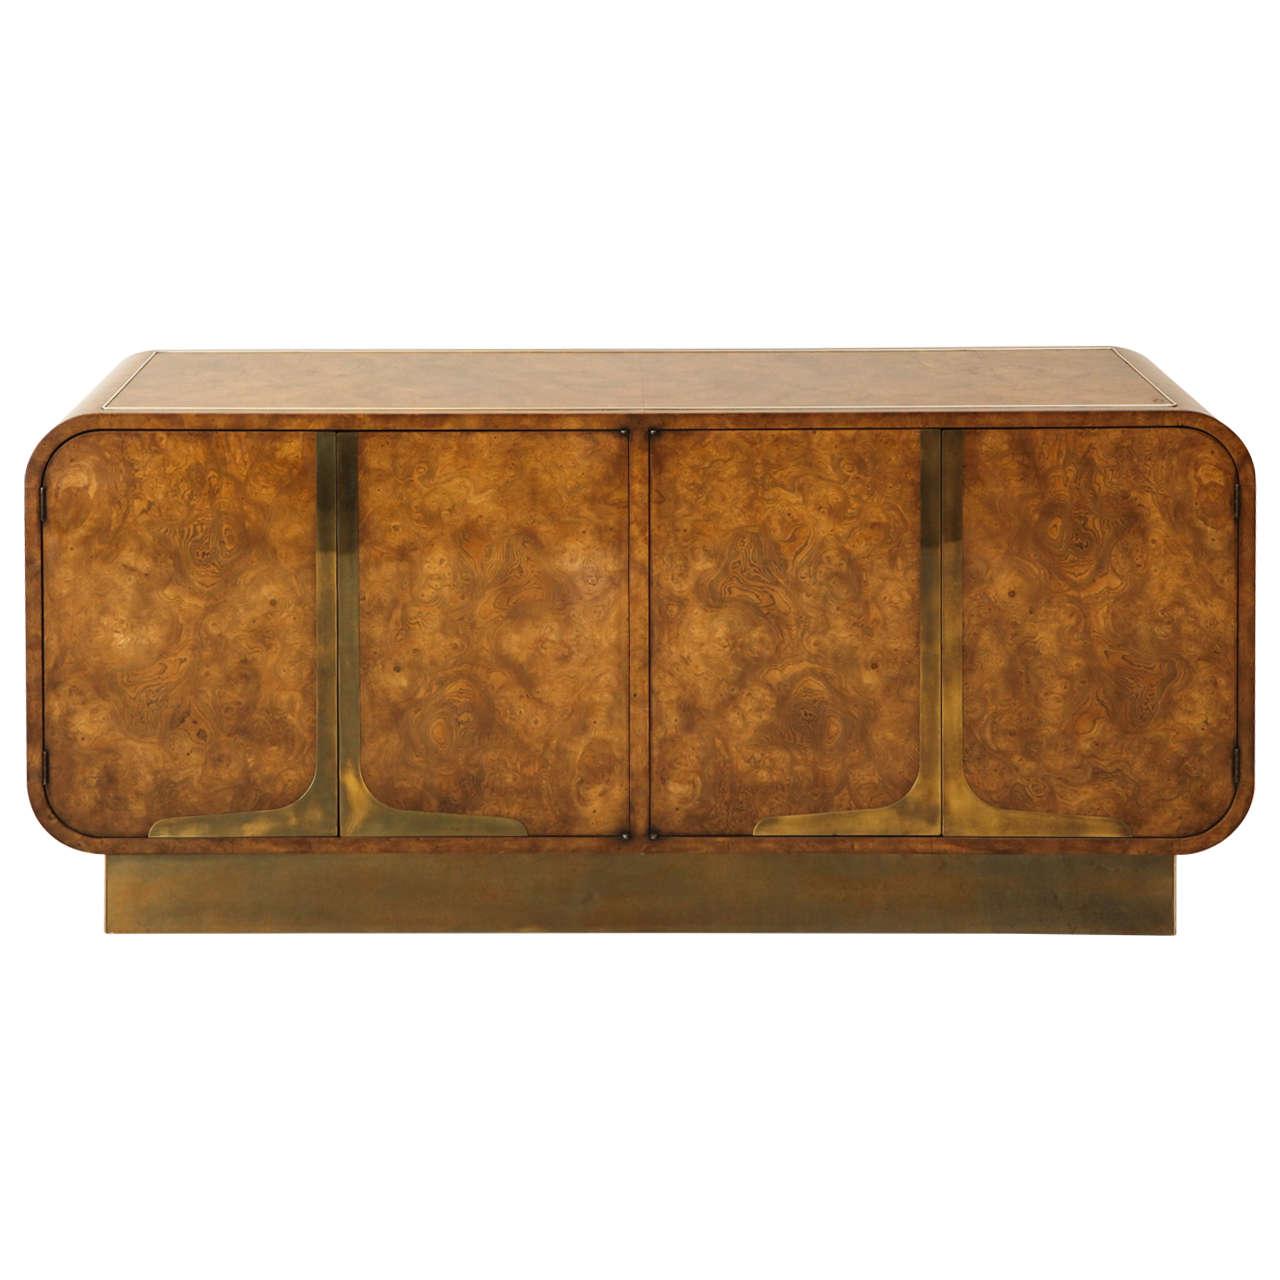 Burled Elmwood Cabinet by Mastercraft For Sale